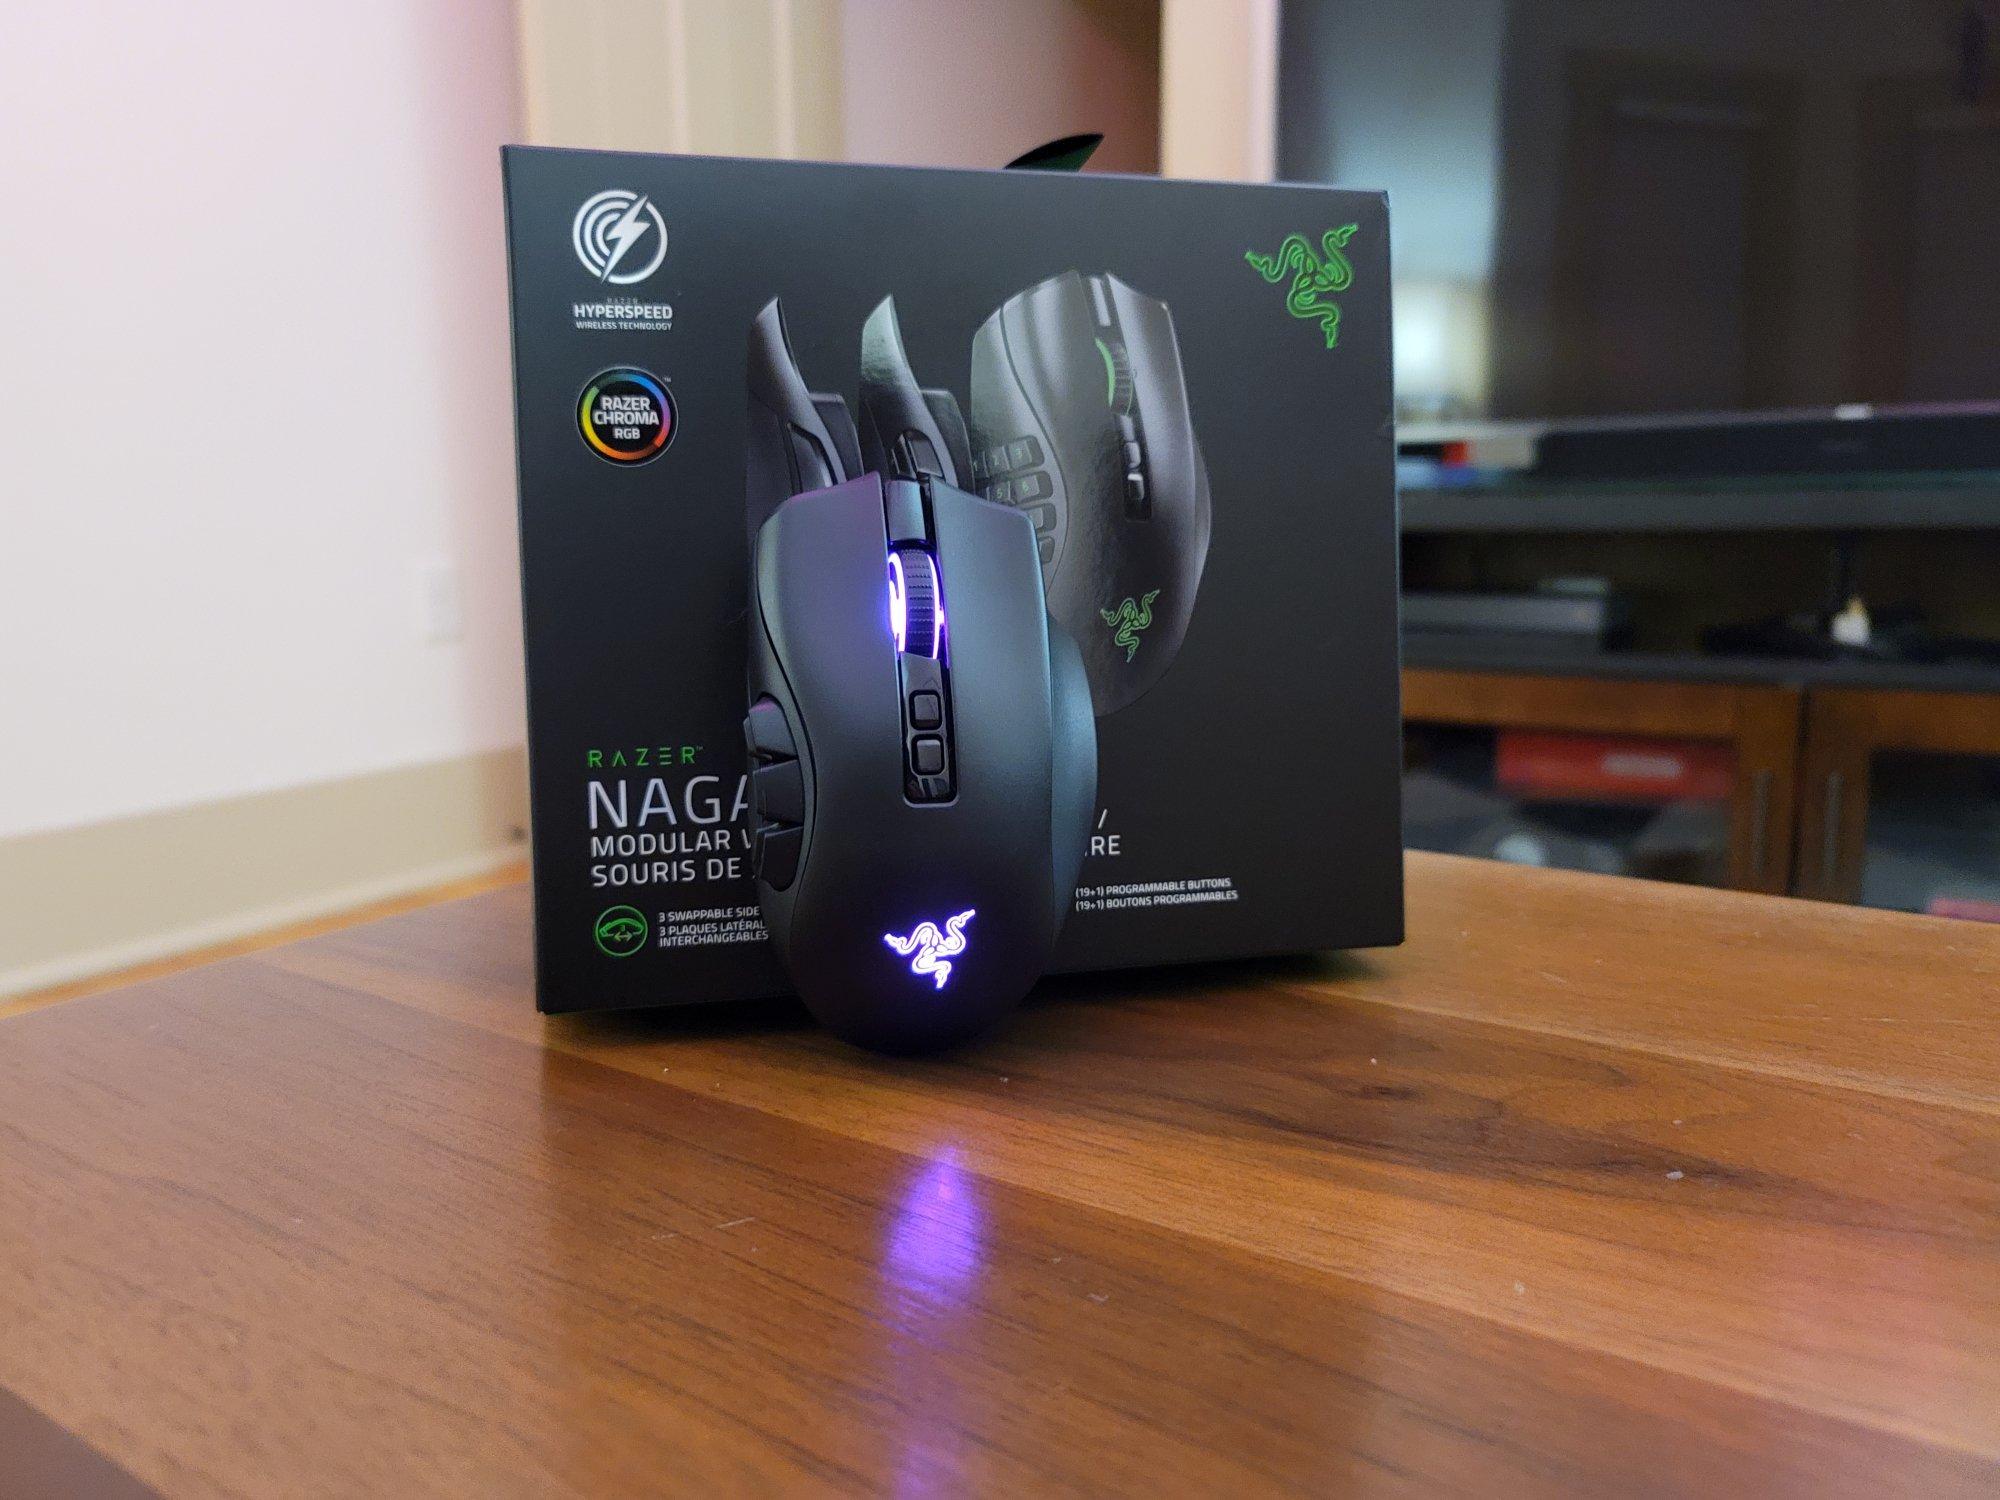 Razer Naga Pro review: A gaming icon achieves wireless domination | Windows Central